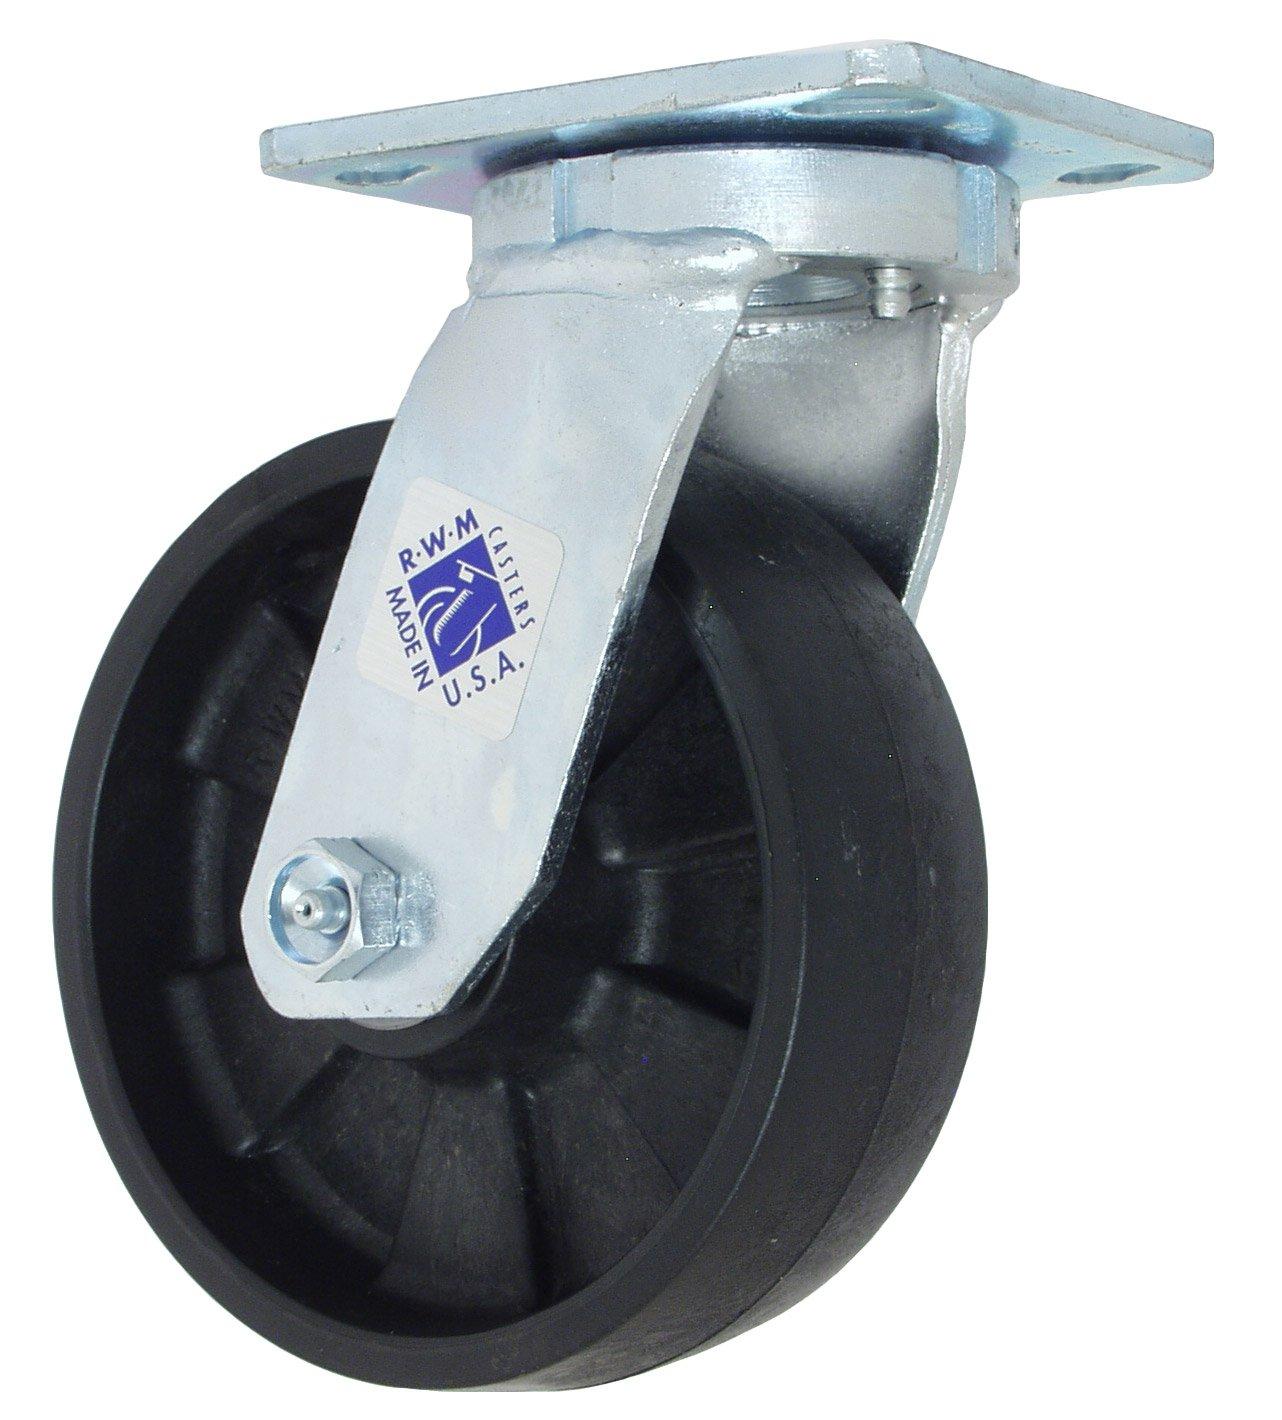 RWM Casters 47-PNR-0620-S 47 Series 7-1/2'' High, 6'' Pinnacle Wheel, Swivel Caster